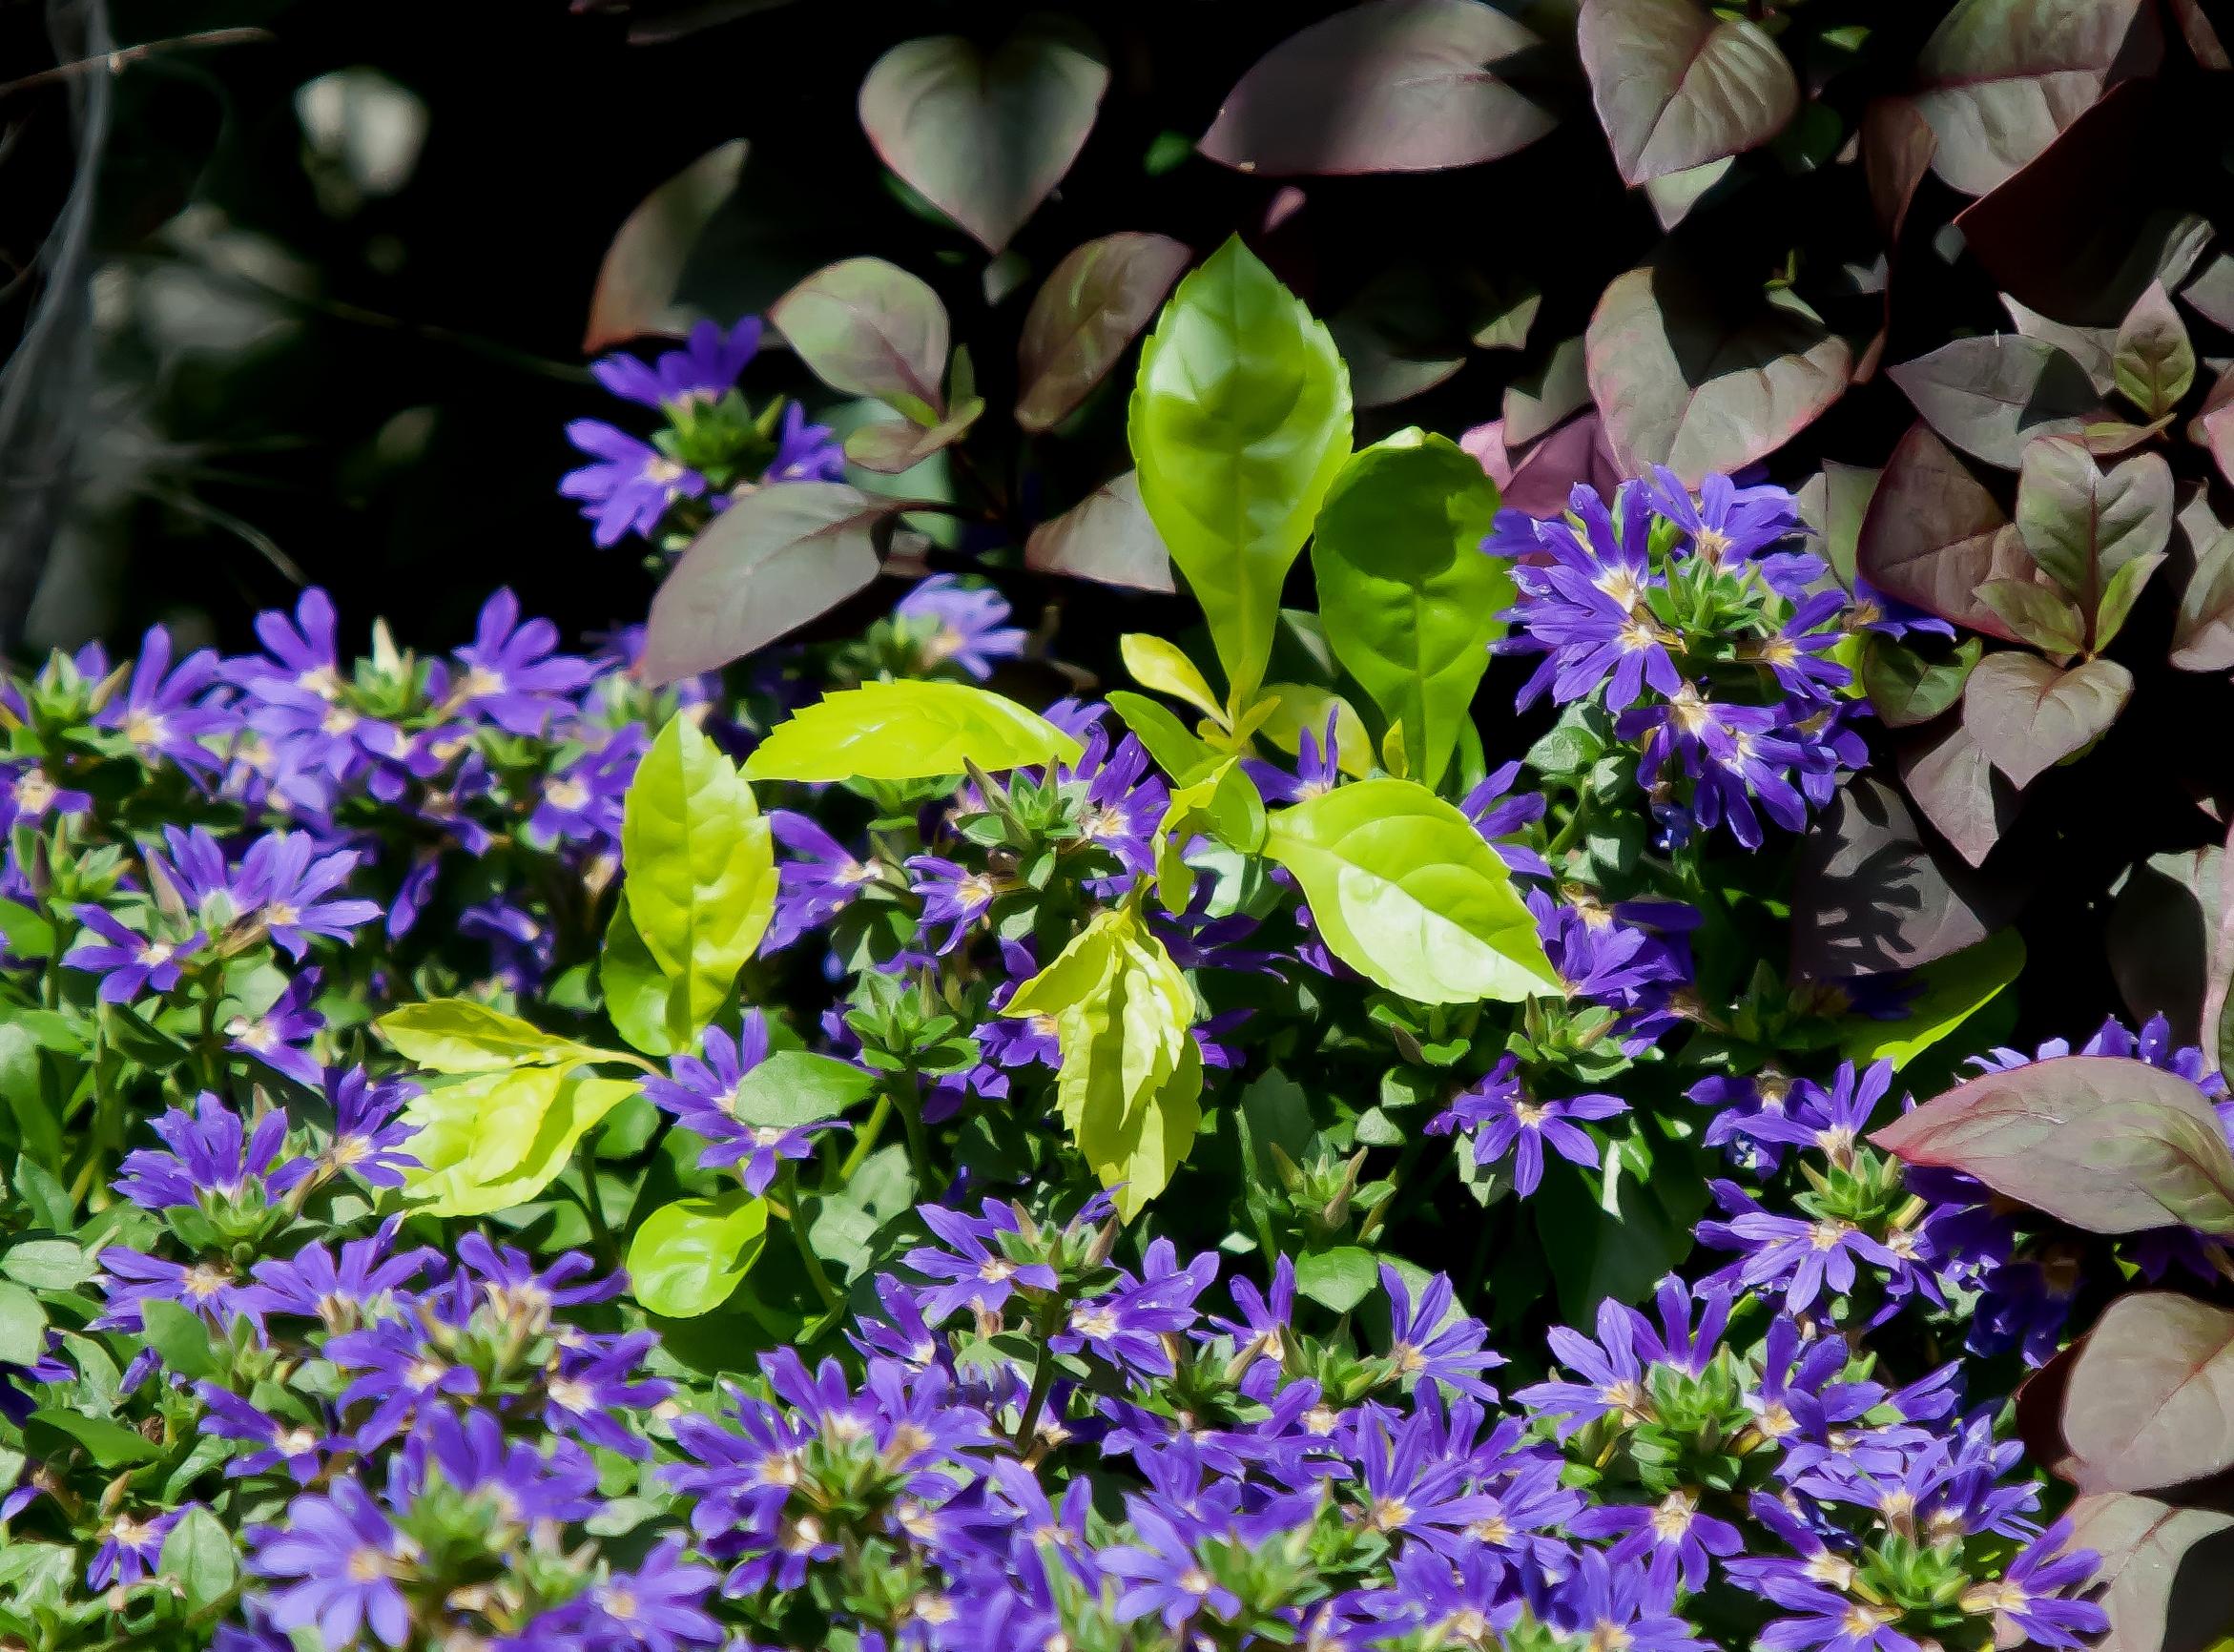 'Surdiva Blue Violet' scaevola combines wonderfully with foliage like 'Little Ruby' alternanthera and 'Gold Mound' duranta.